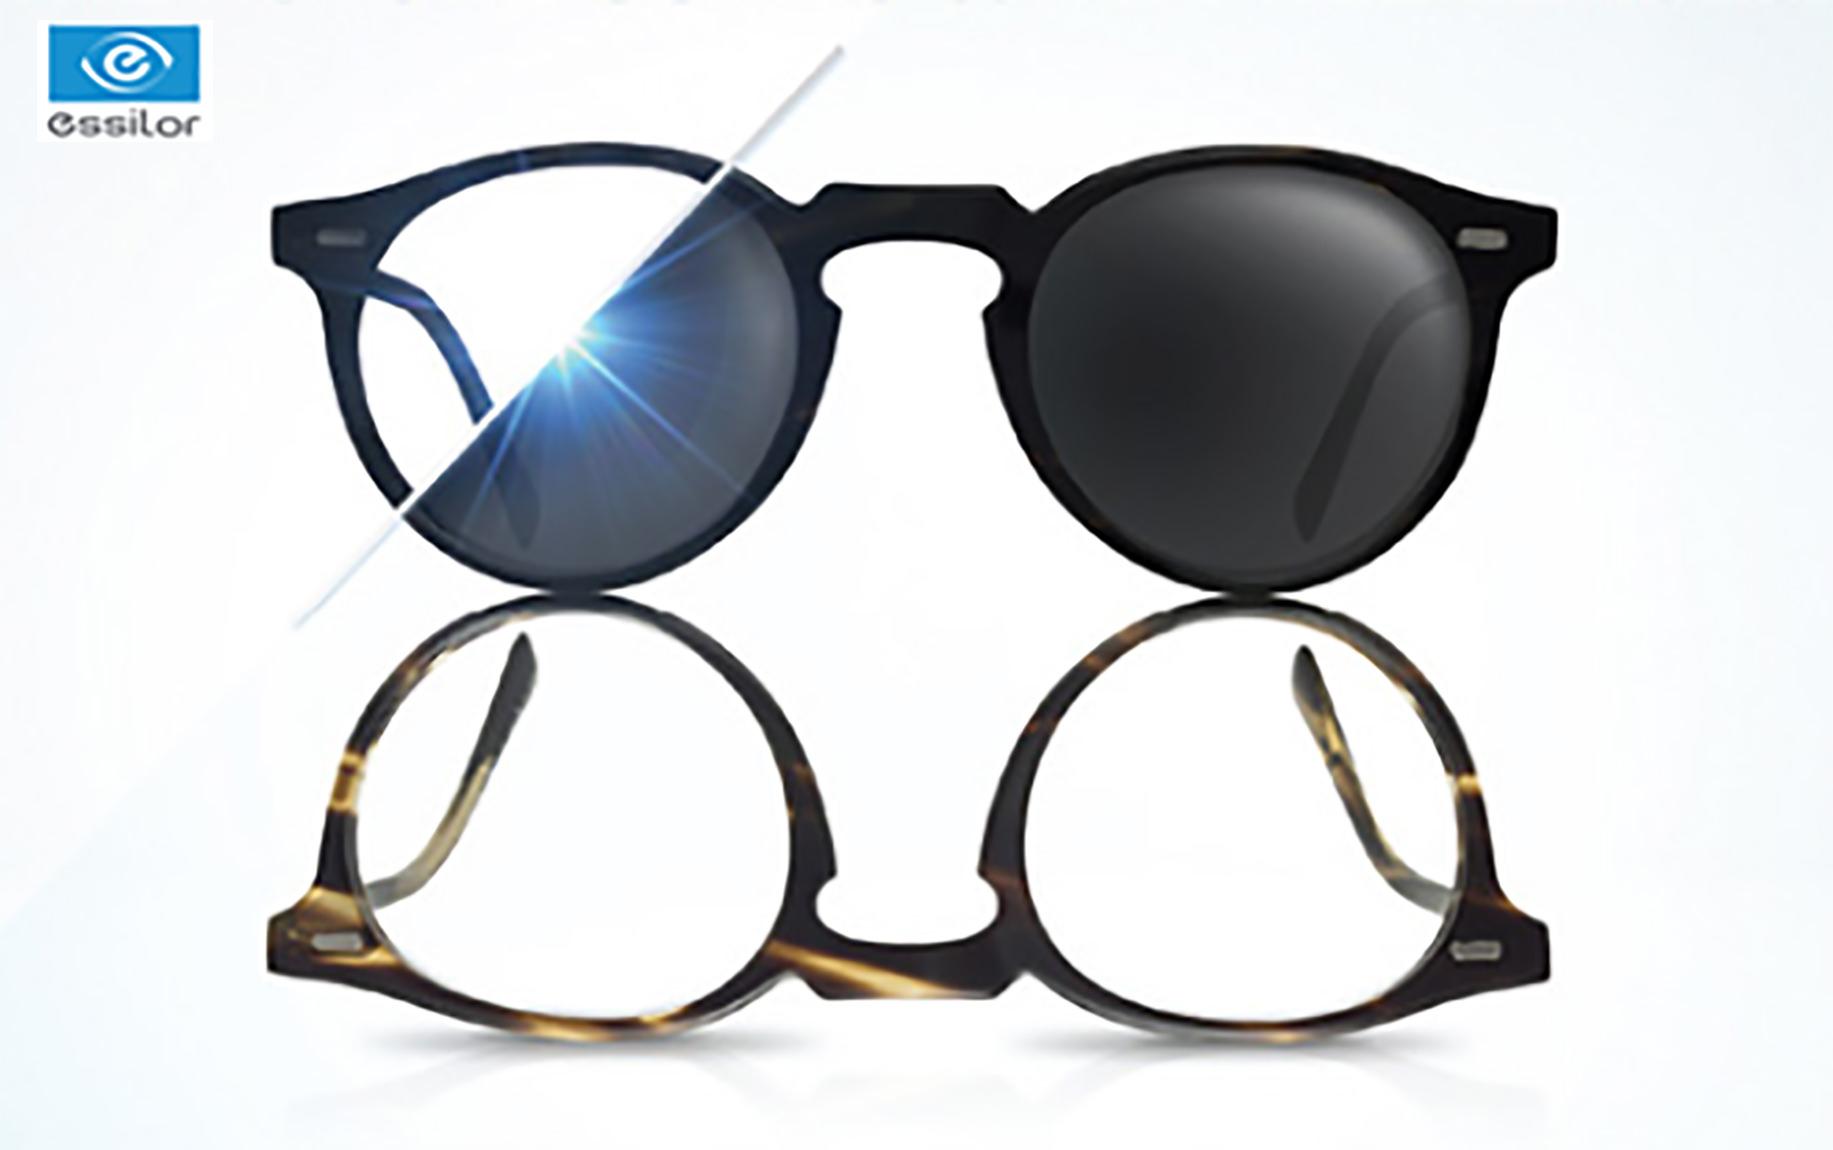 Adair Eyewear creates superior lenses for eyeglasses